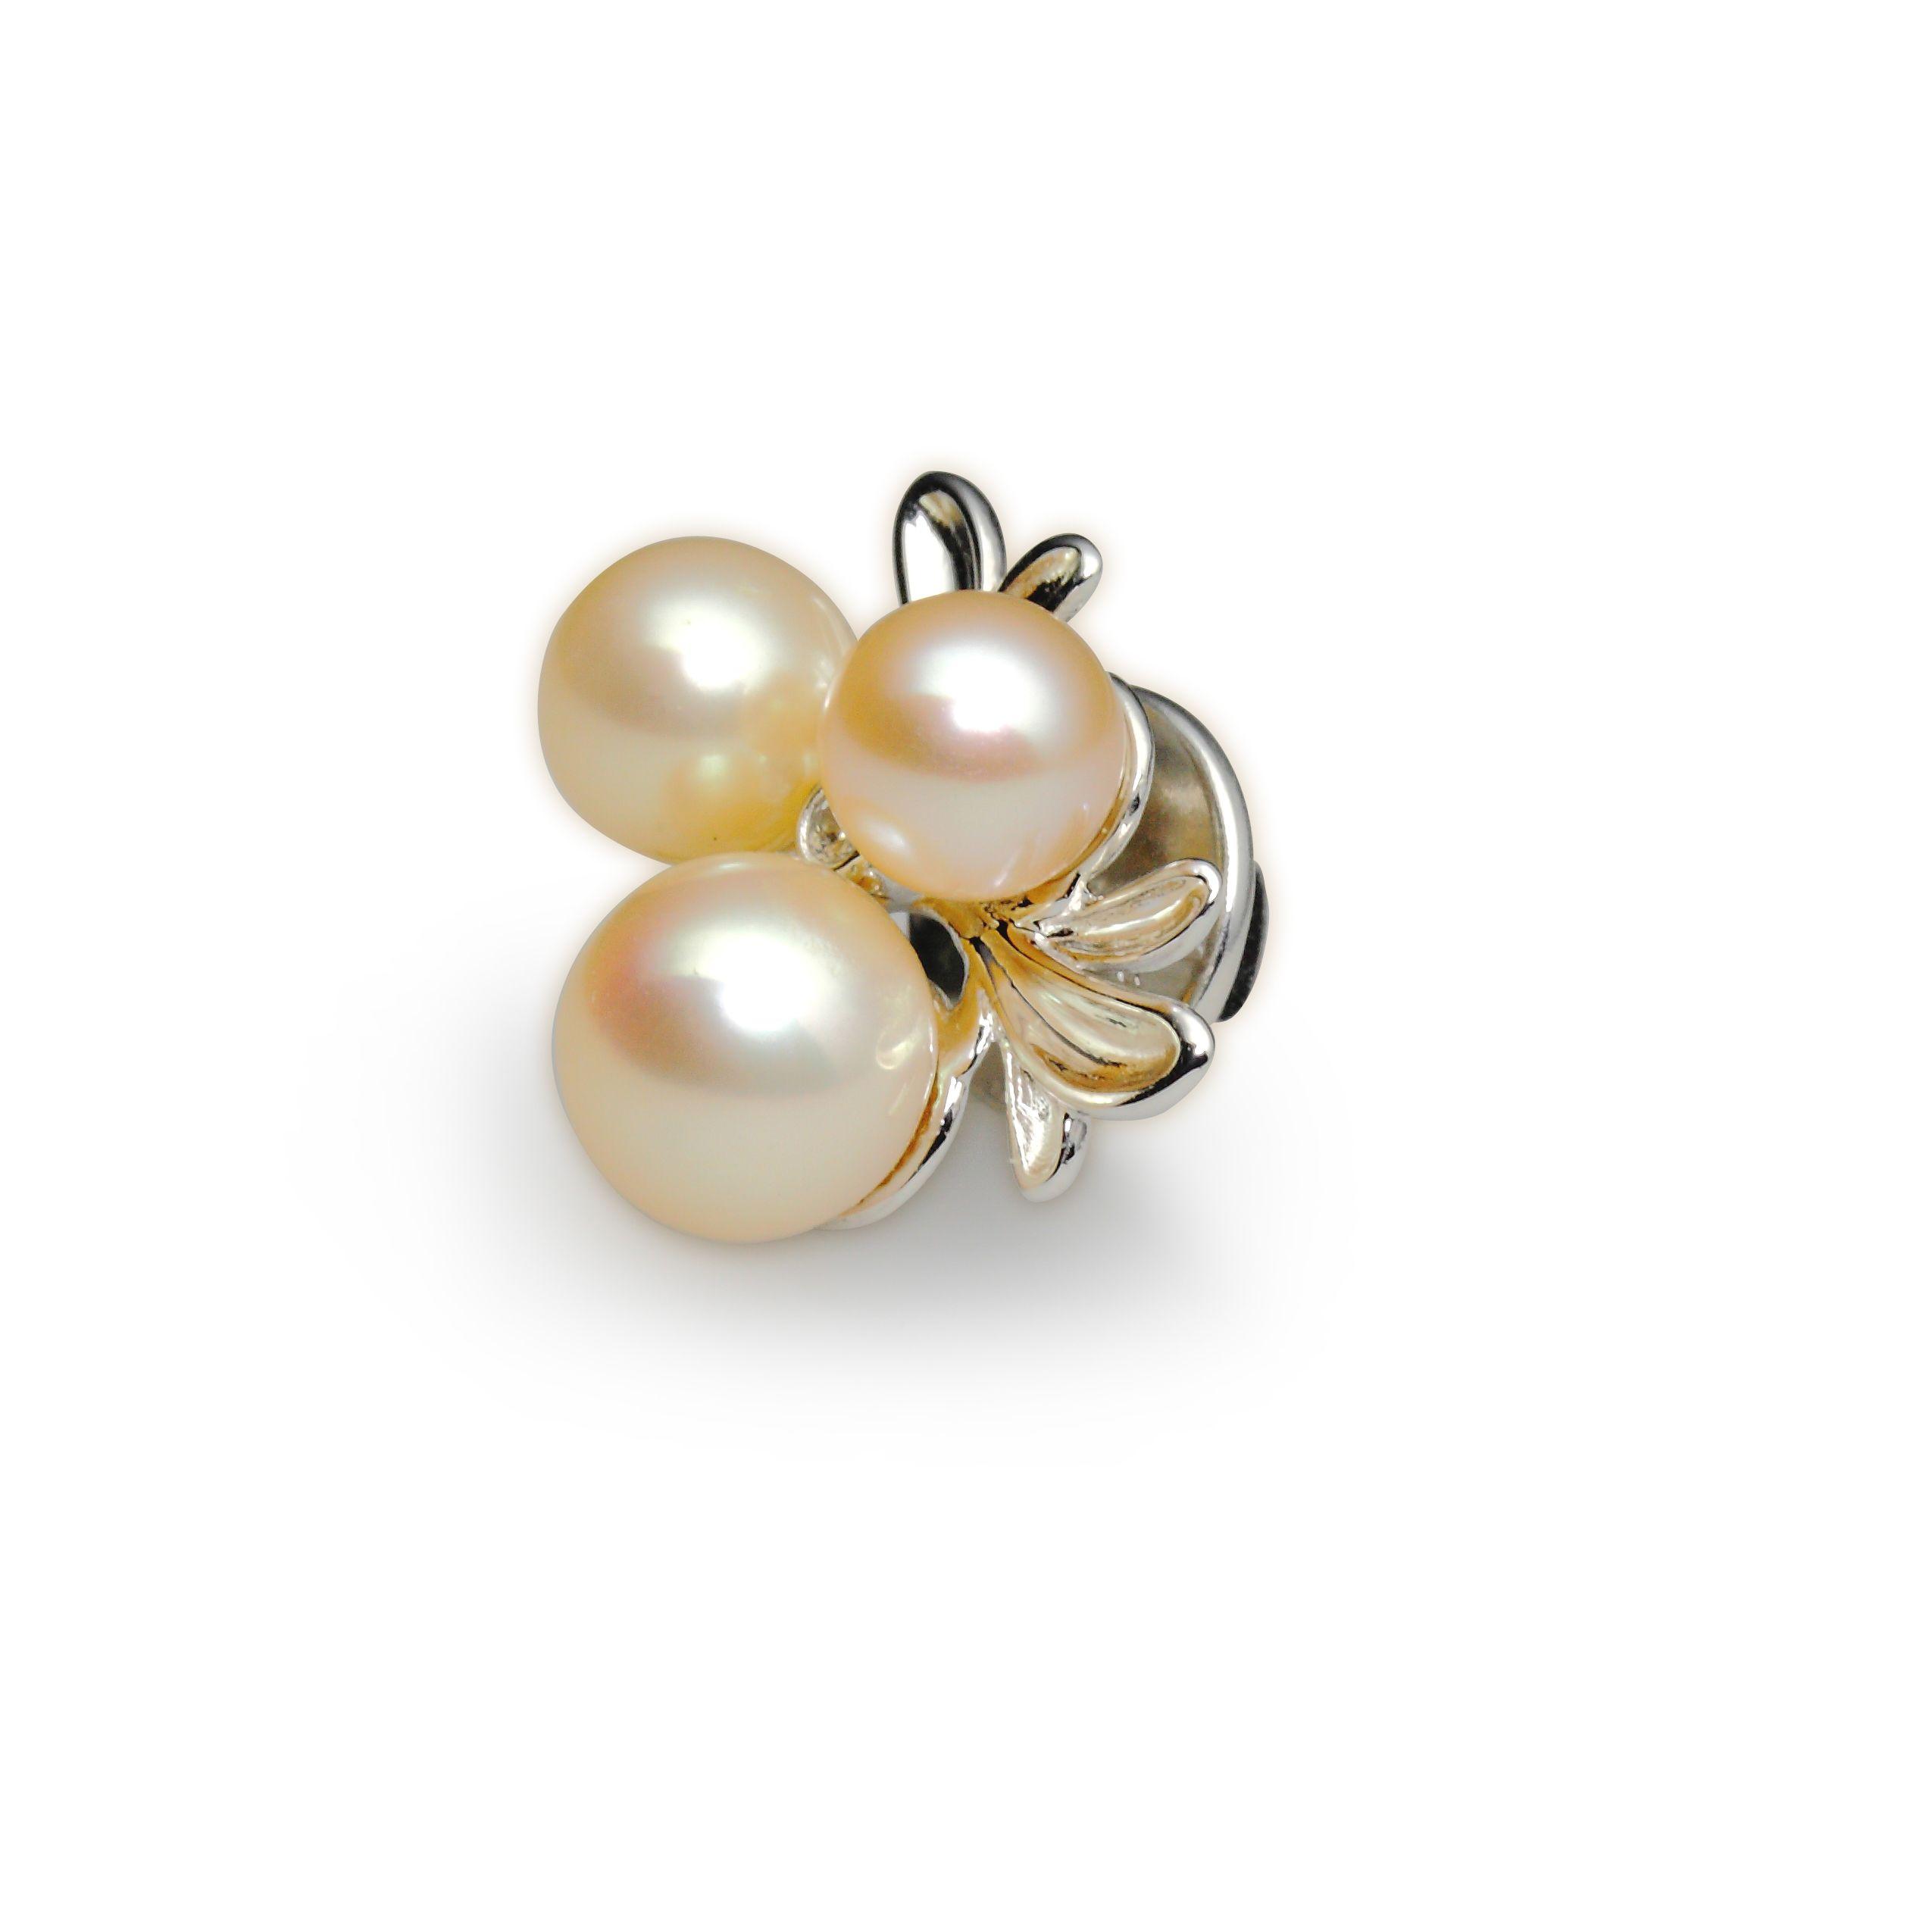 freshwater pearl 8,0-8,5 mm - 1x, 7,0-7,5 mm - 1x, 6,0-6,5 mm - 1x, zircon 1,75 mm - 1x